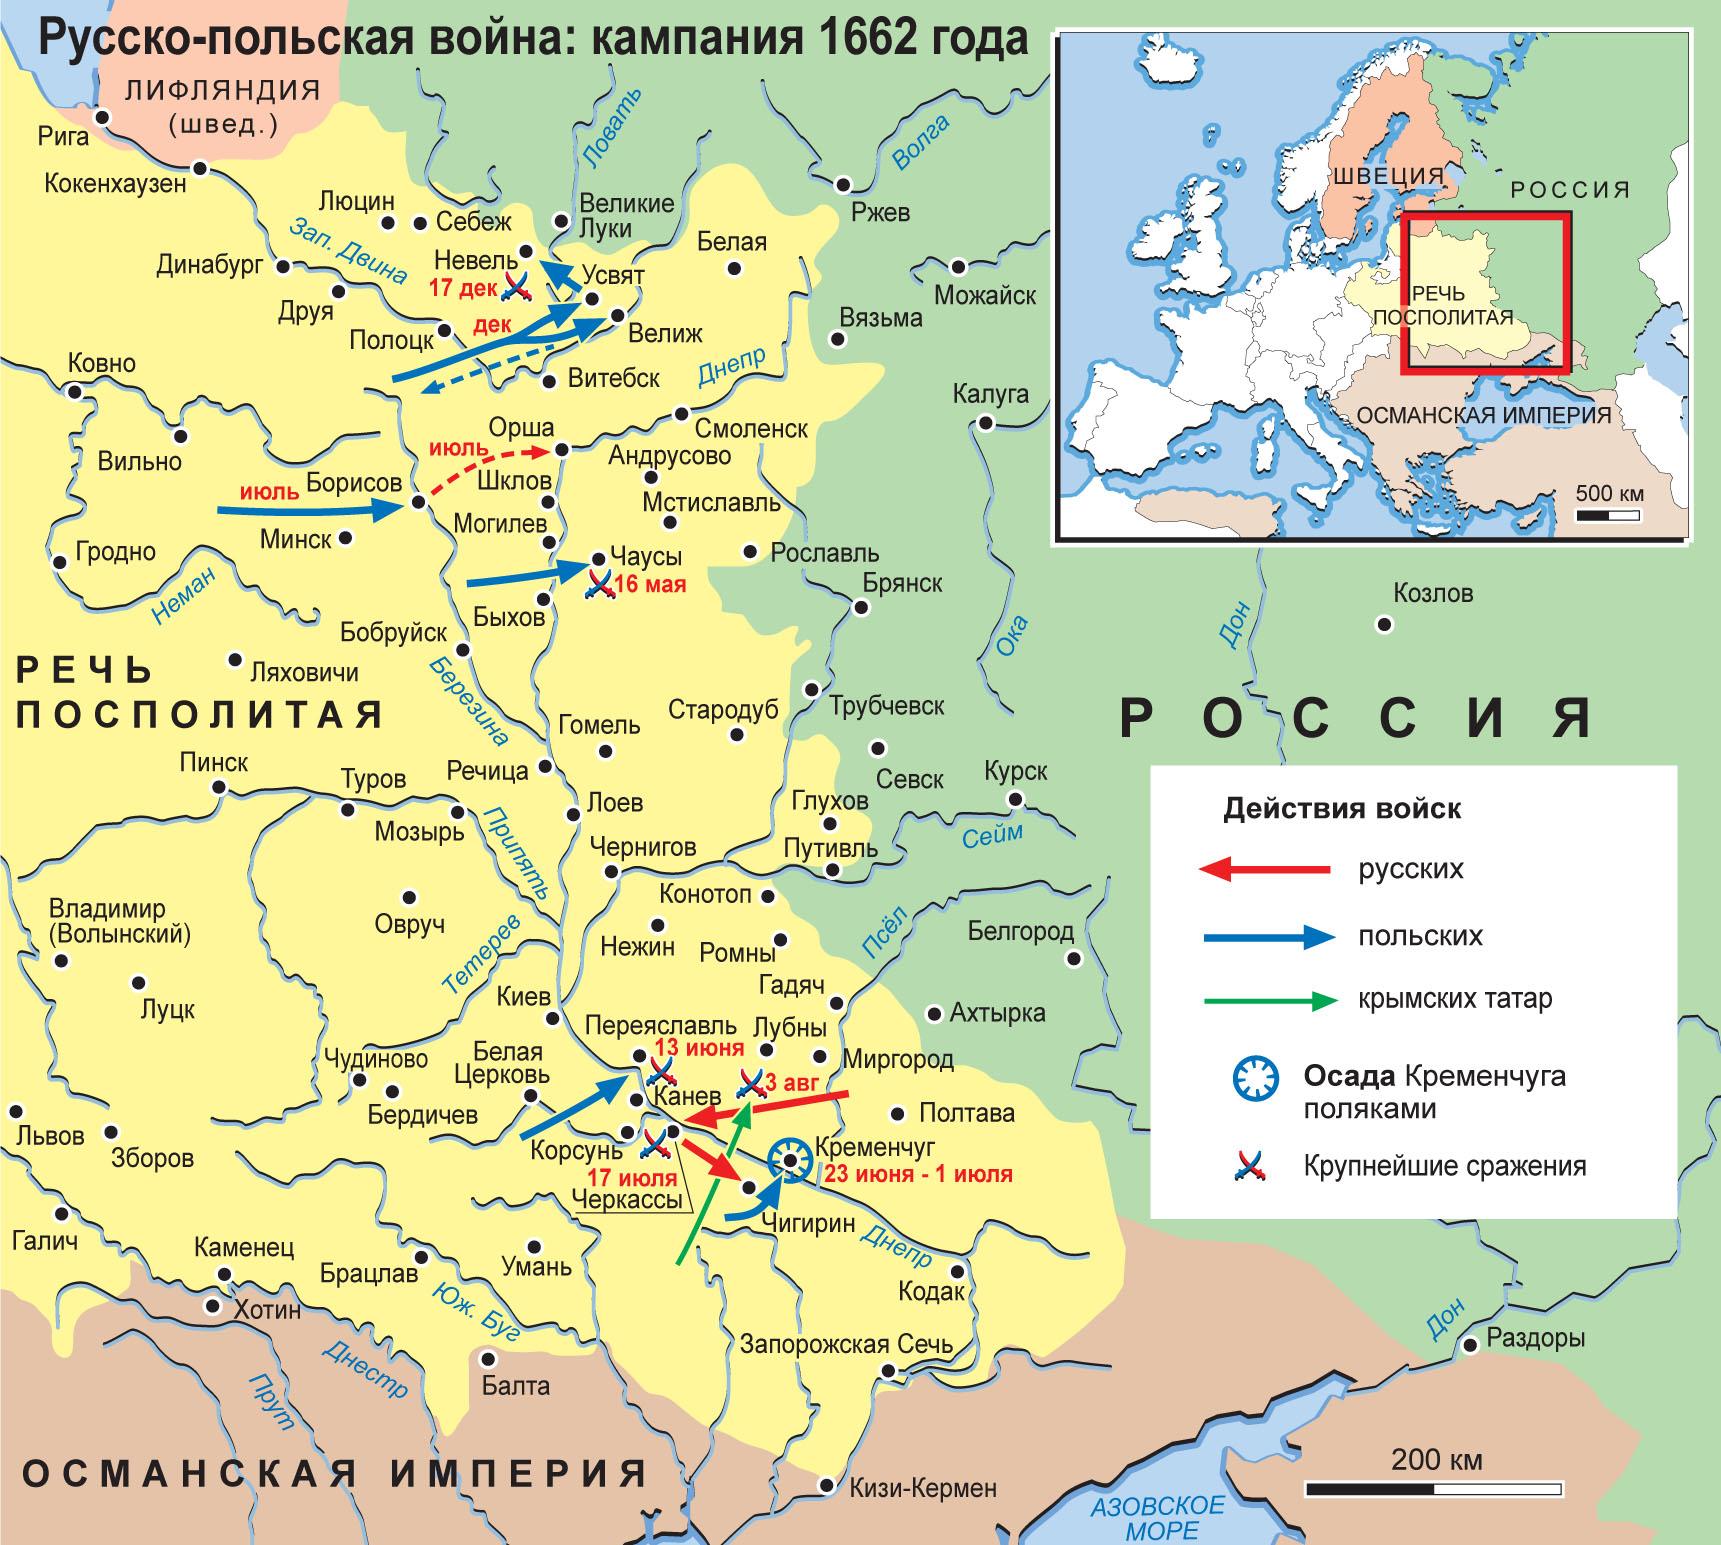 Новая страница (1): http://www.runivers.ru/vh/polskaya_1662.php